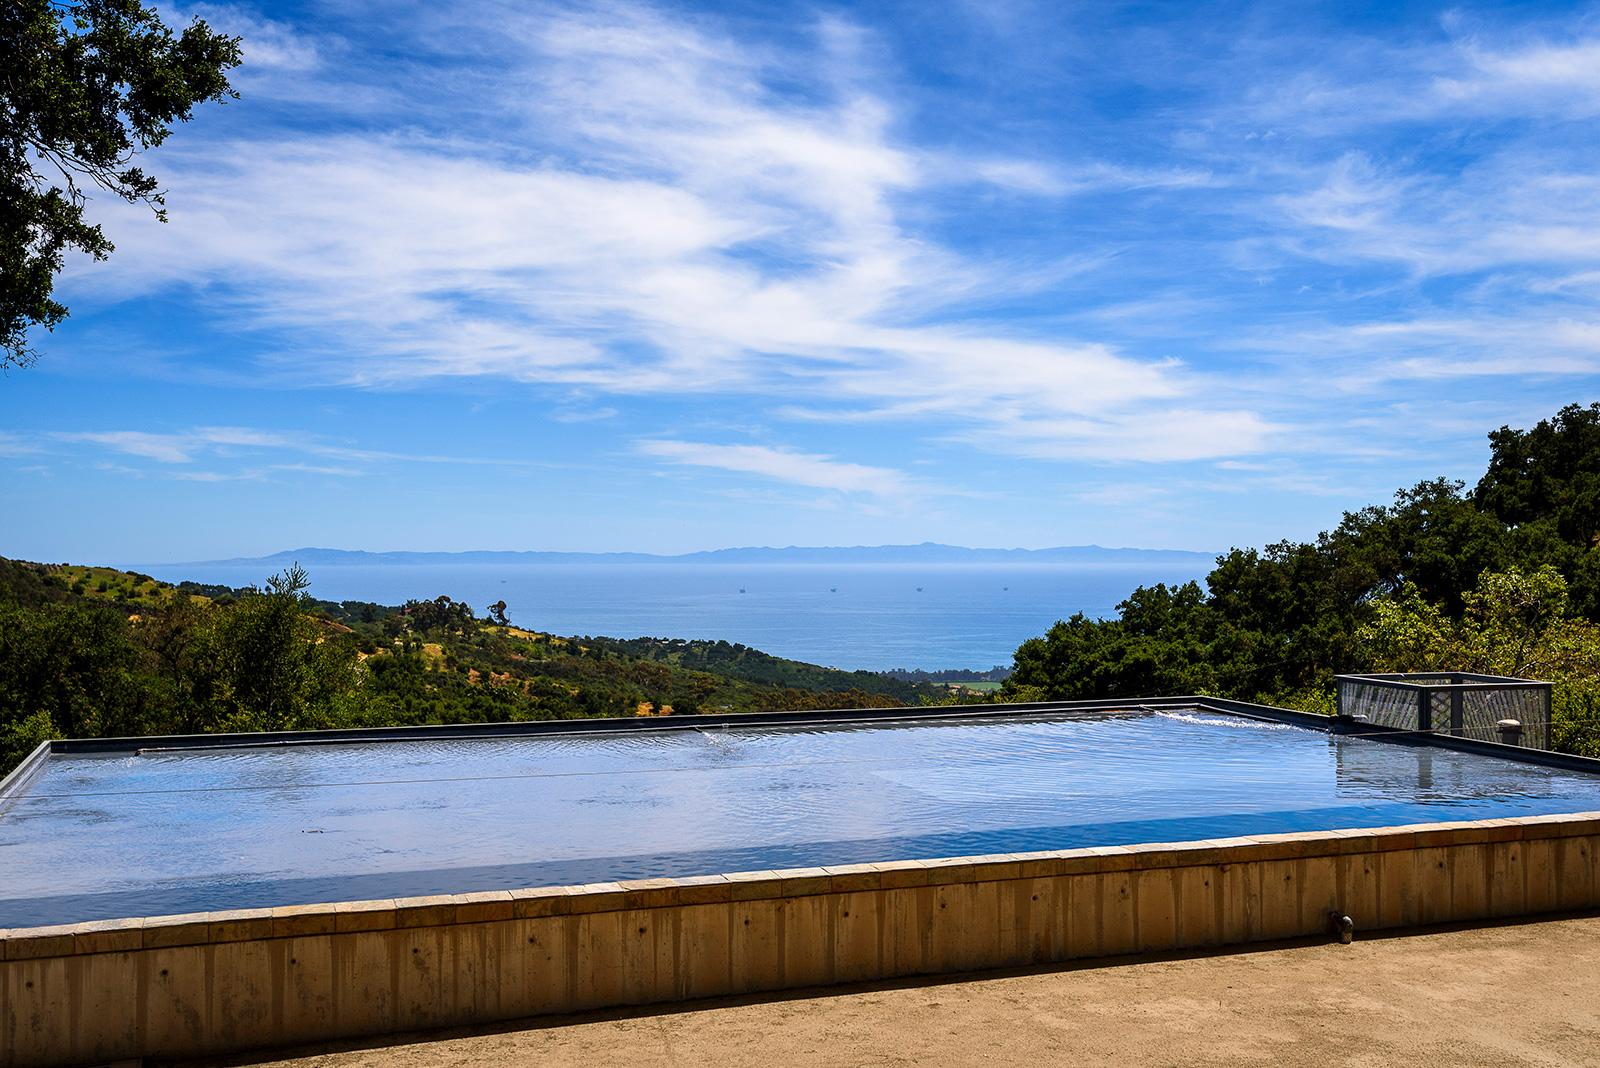 Barton Myers is selling his pioneering prefab Santa Barbara home